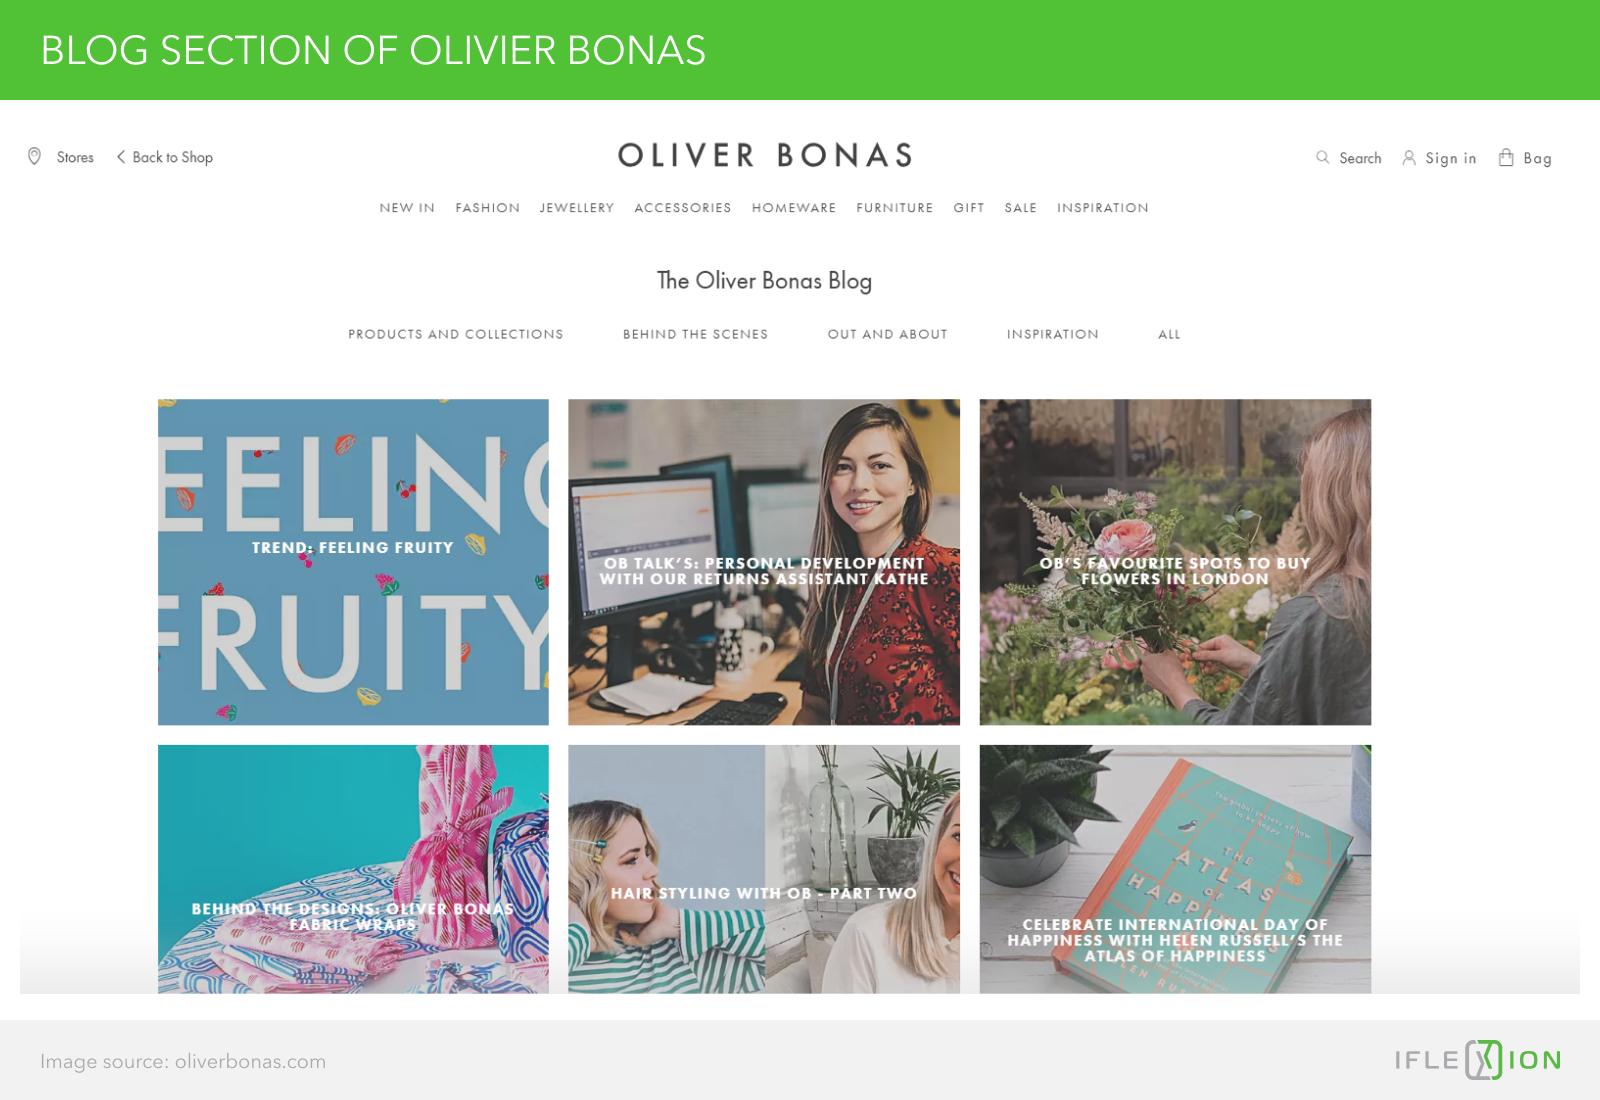 Blog section of Oliver Bonas